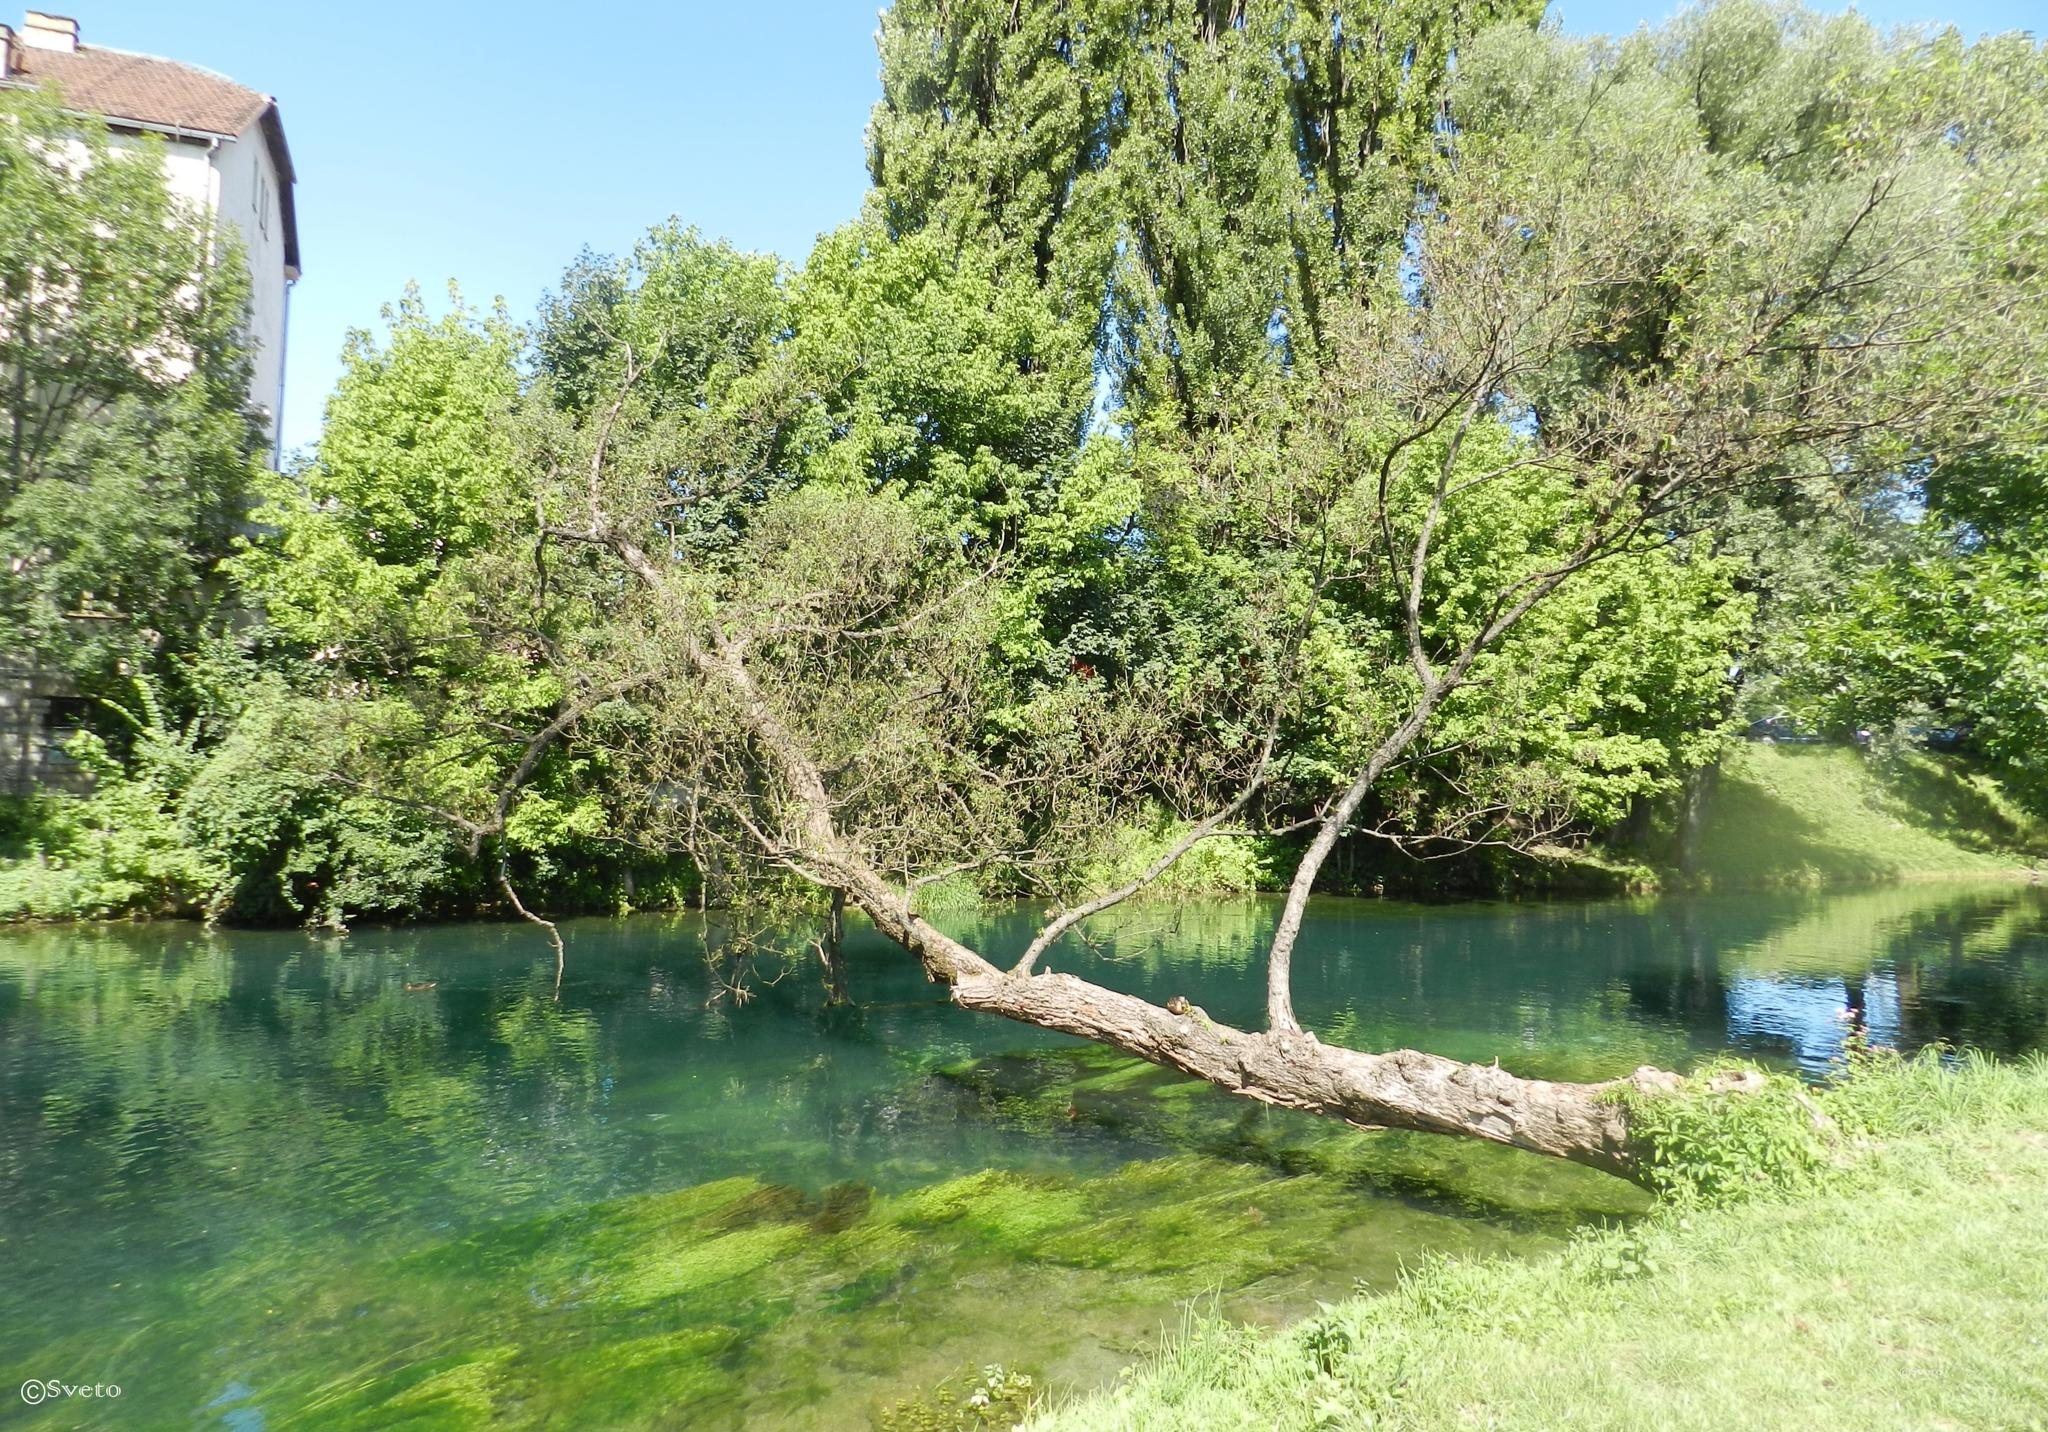 Bihać, Bosna i Hercegovina by stevsveto